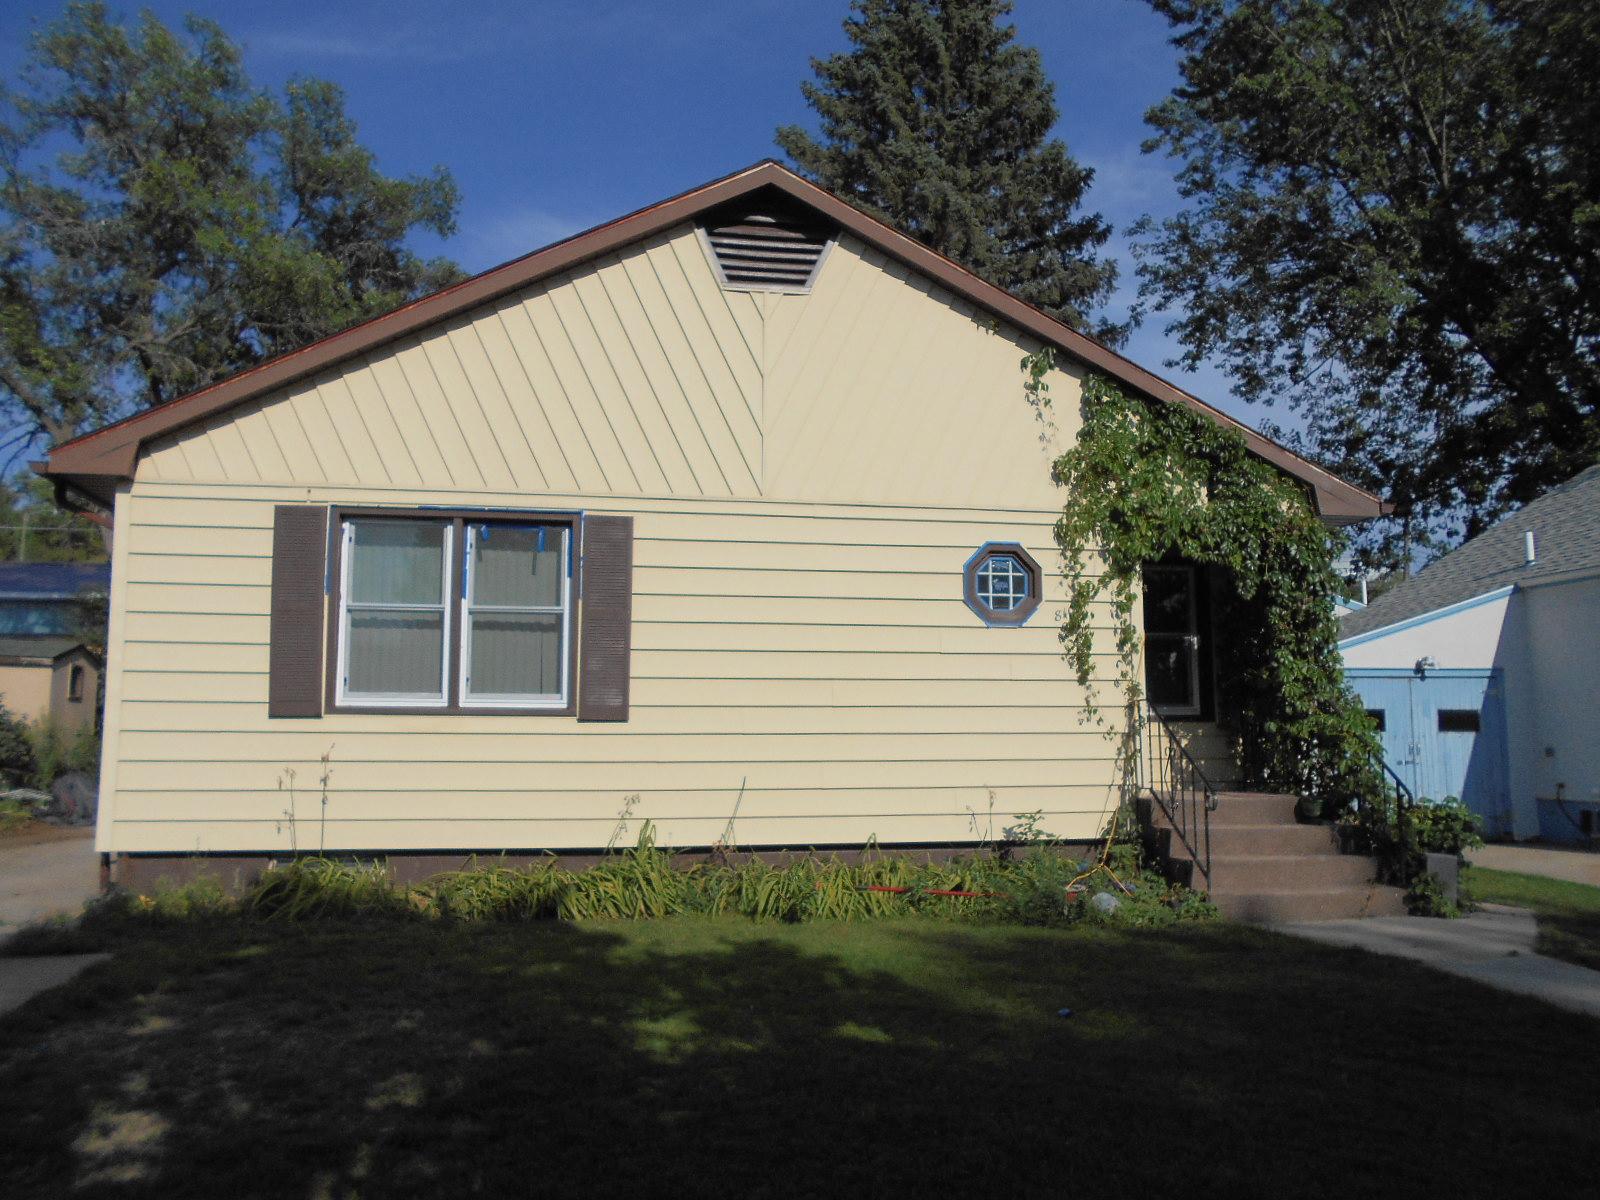 810 2nd Ave Ne, Jamestown, North Dakota 58401